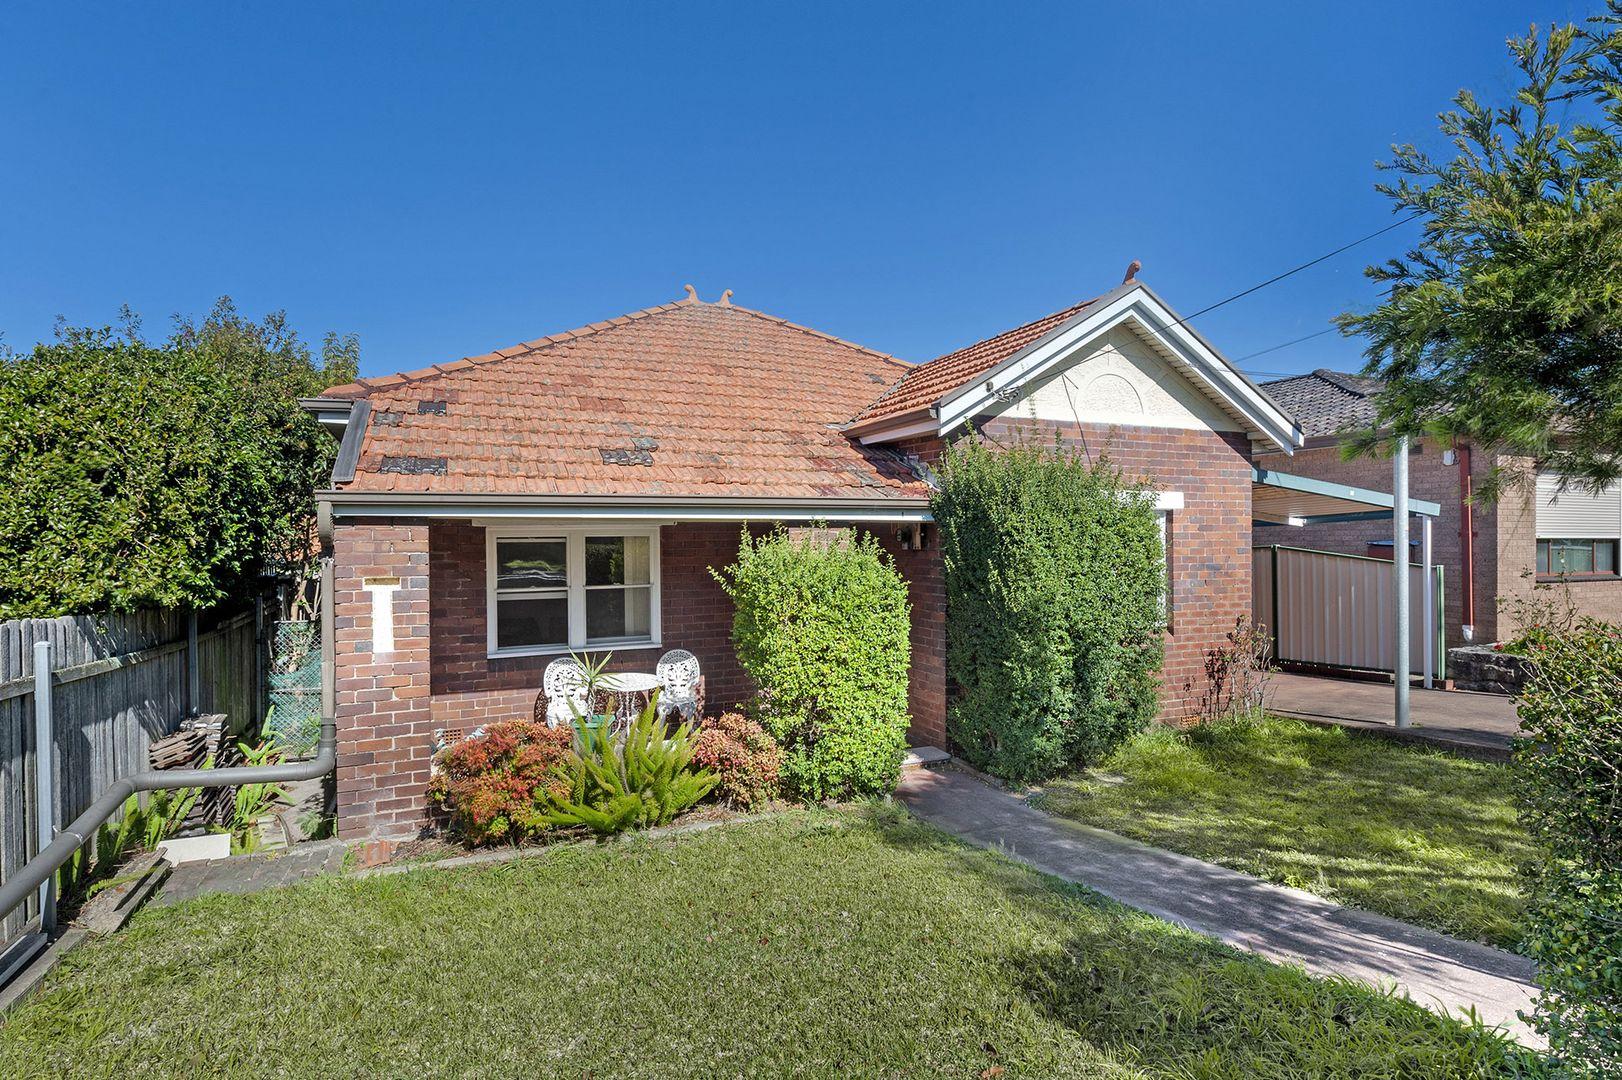 1 & 1A Lea Avenue, Russell Lea NSW 2046, Image 0